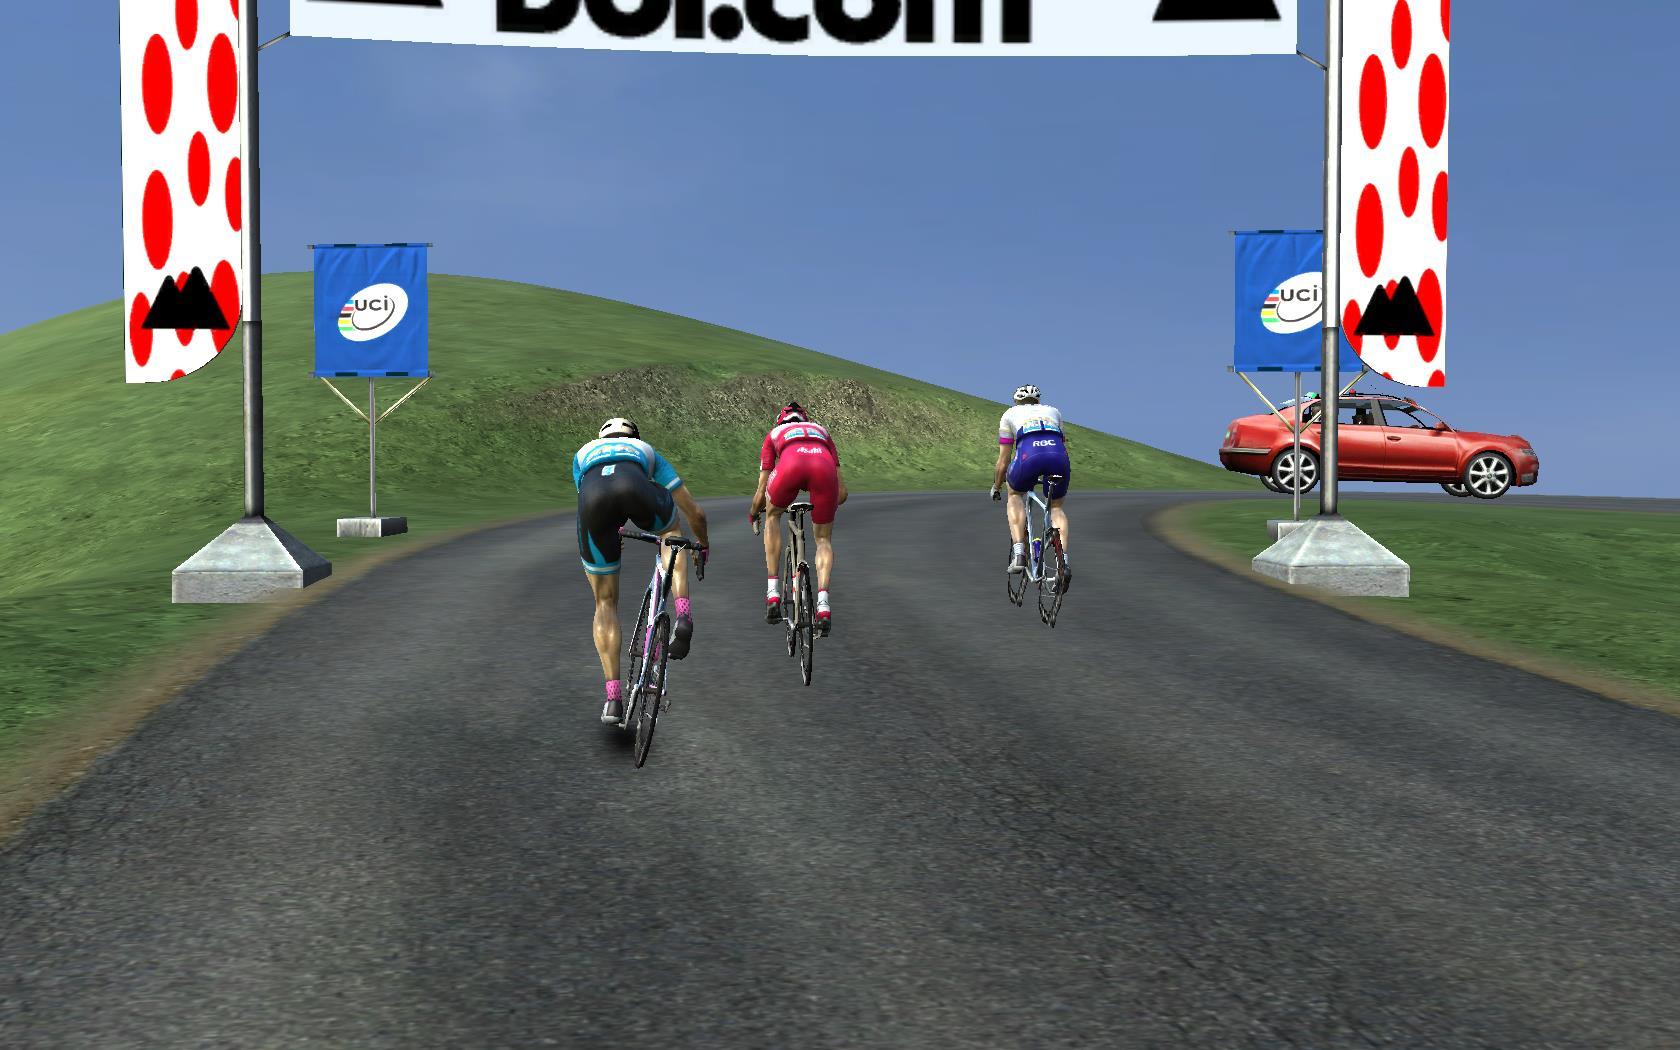 pcmdaily.com/images/mg/2018/Races/C2/USAPCC/1/PCM0004.jpg